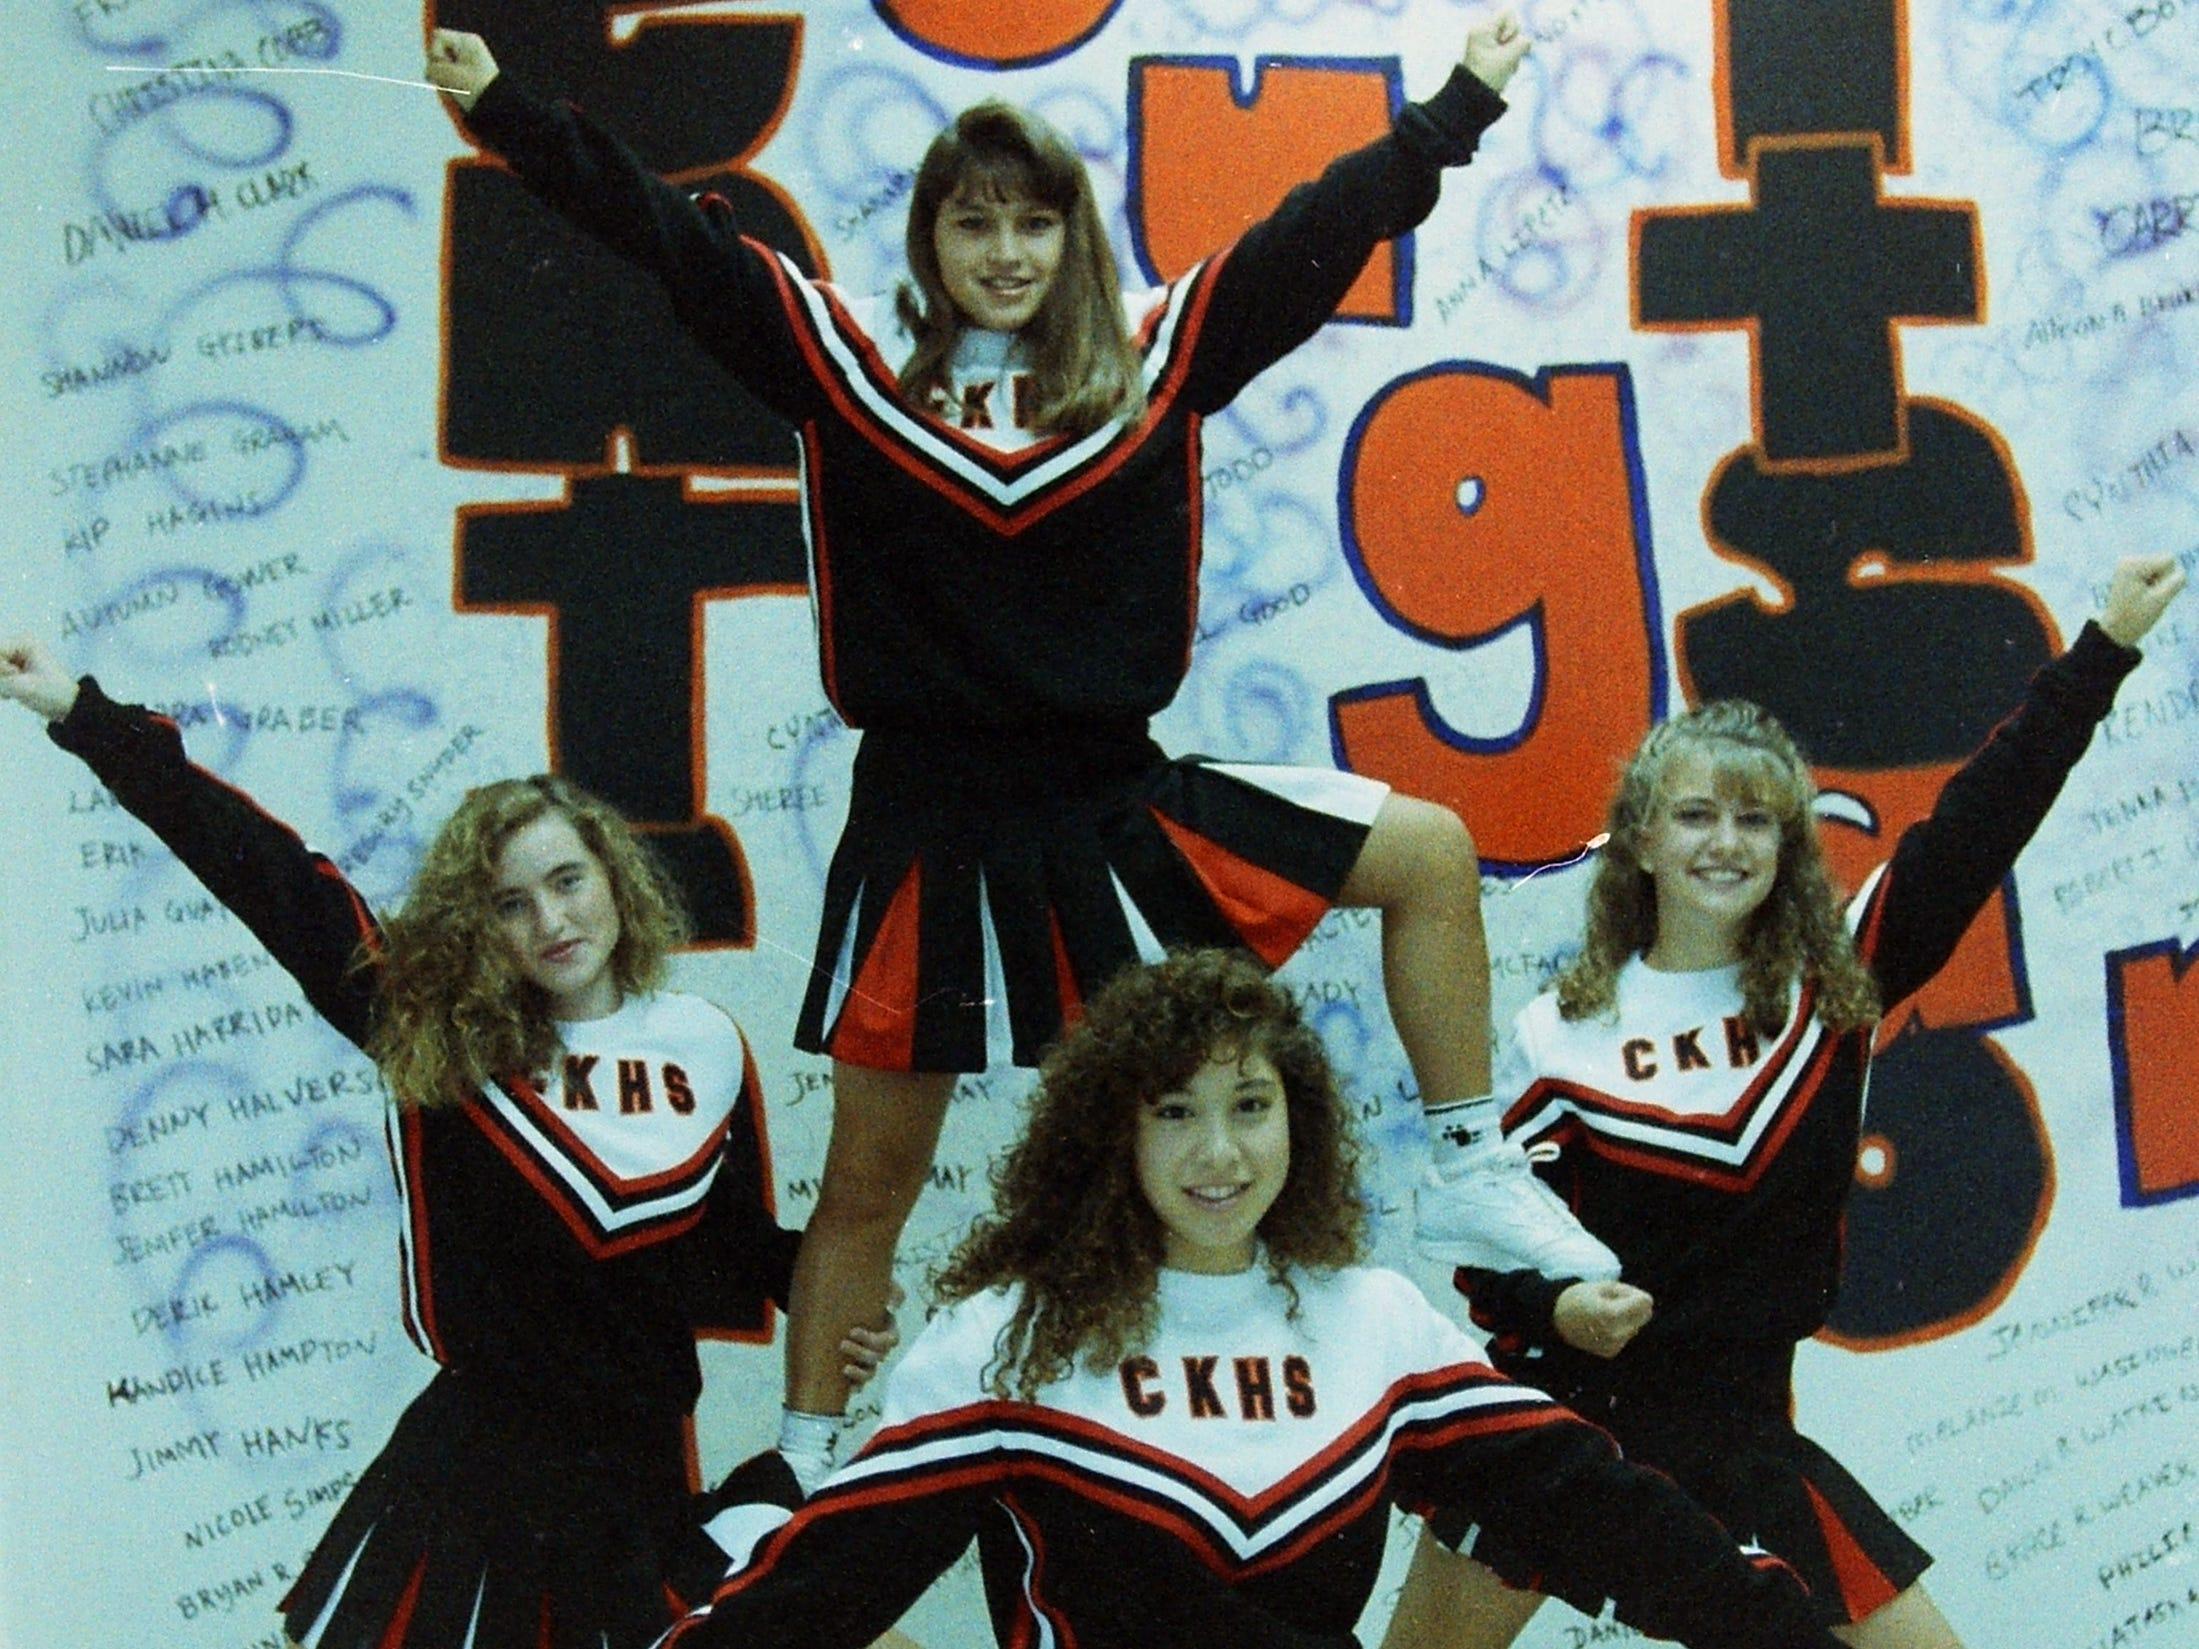 08/30/91Ck Cheerleaders